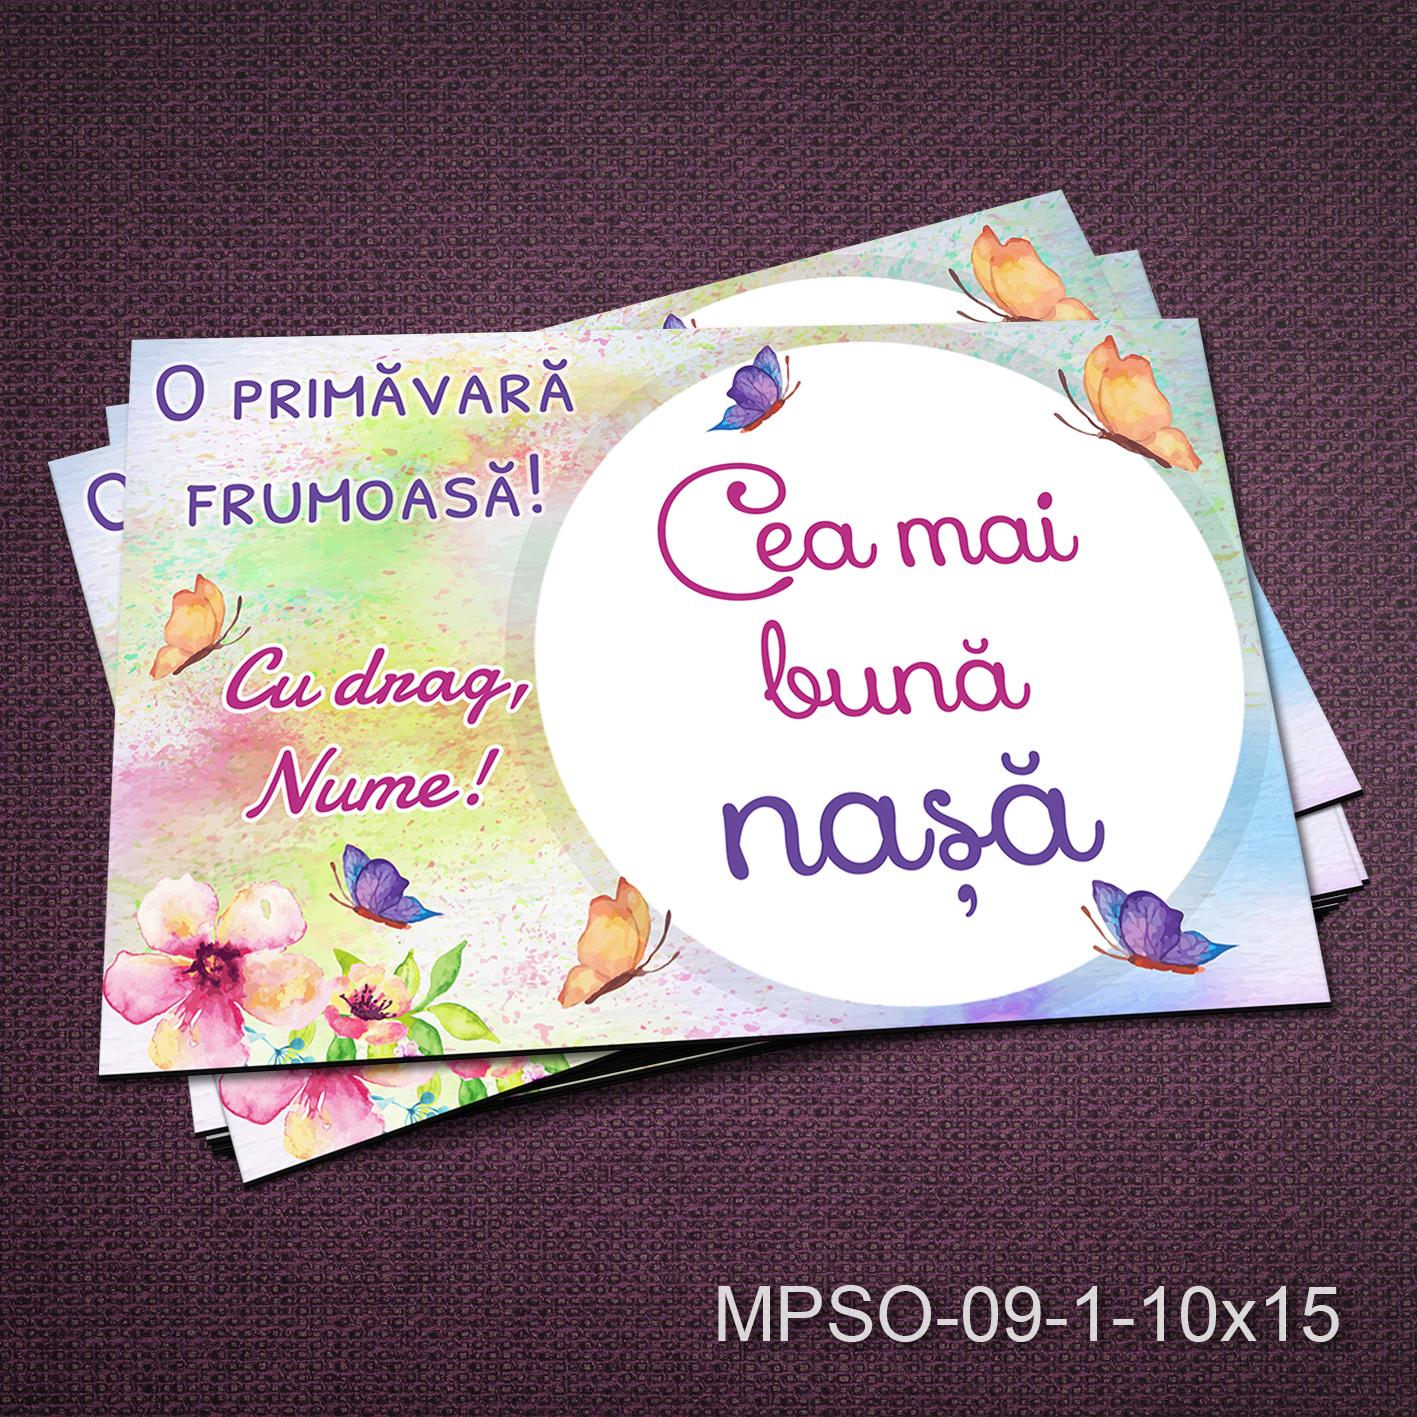 Felicitare magnetica - cea mai buna nasa - MPSO-09-1-10x15